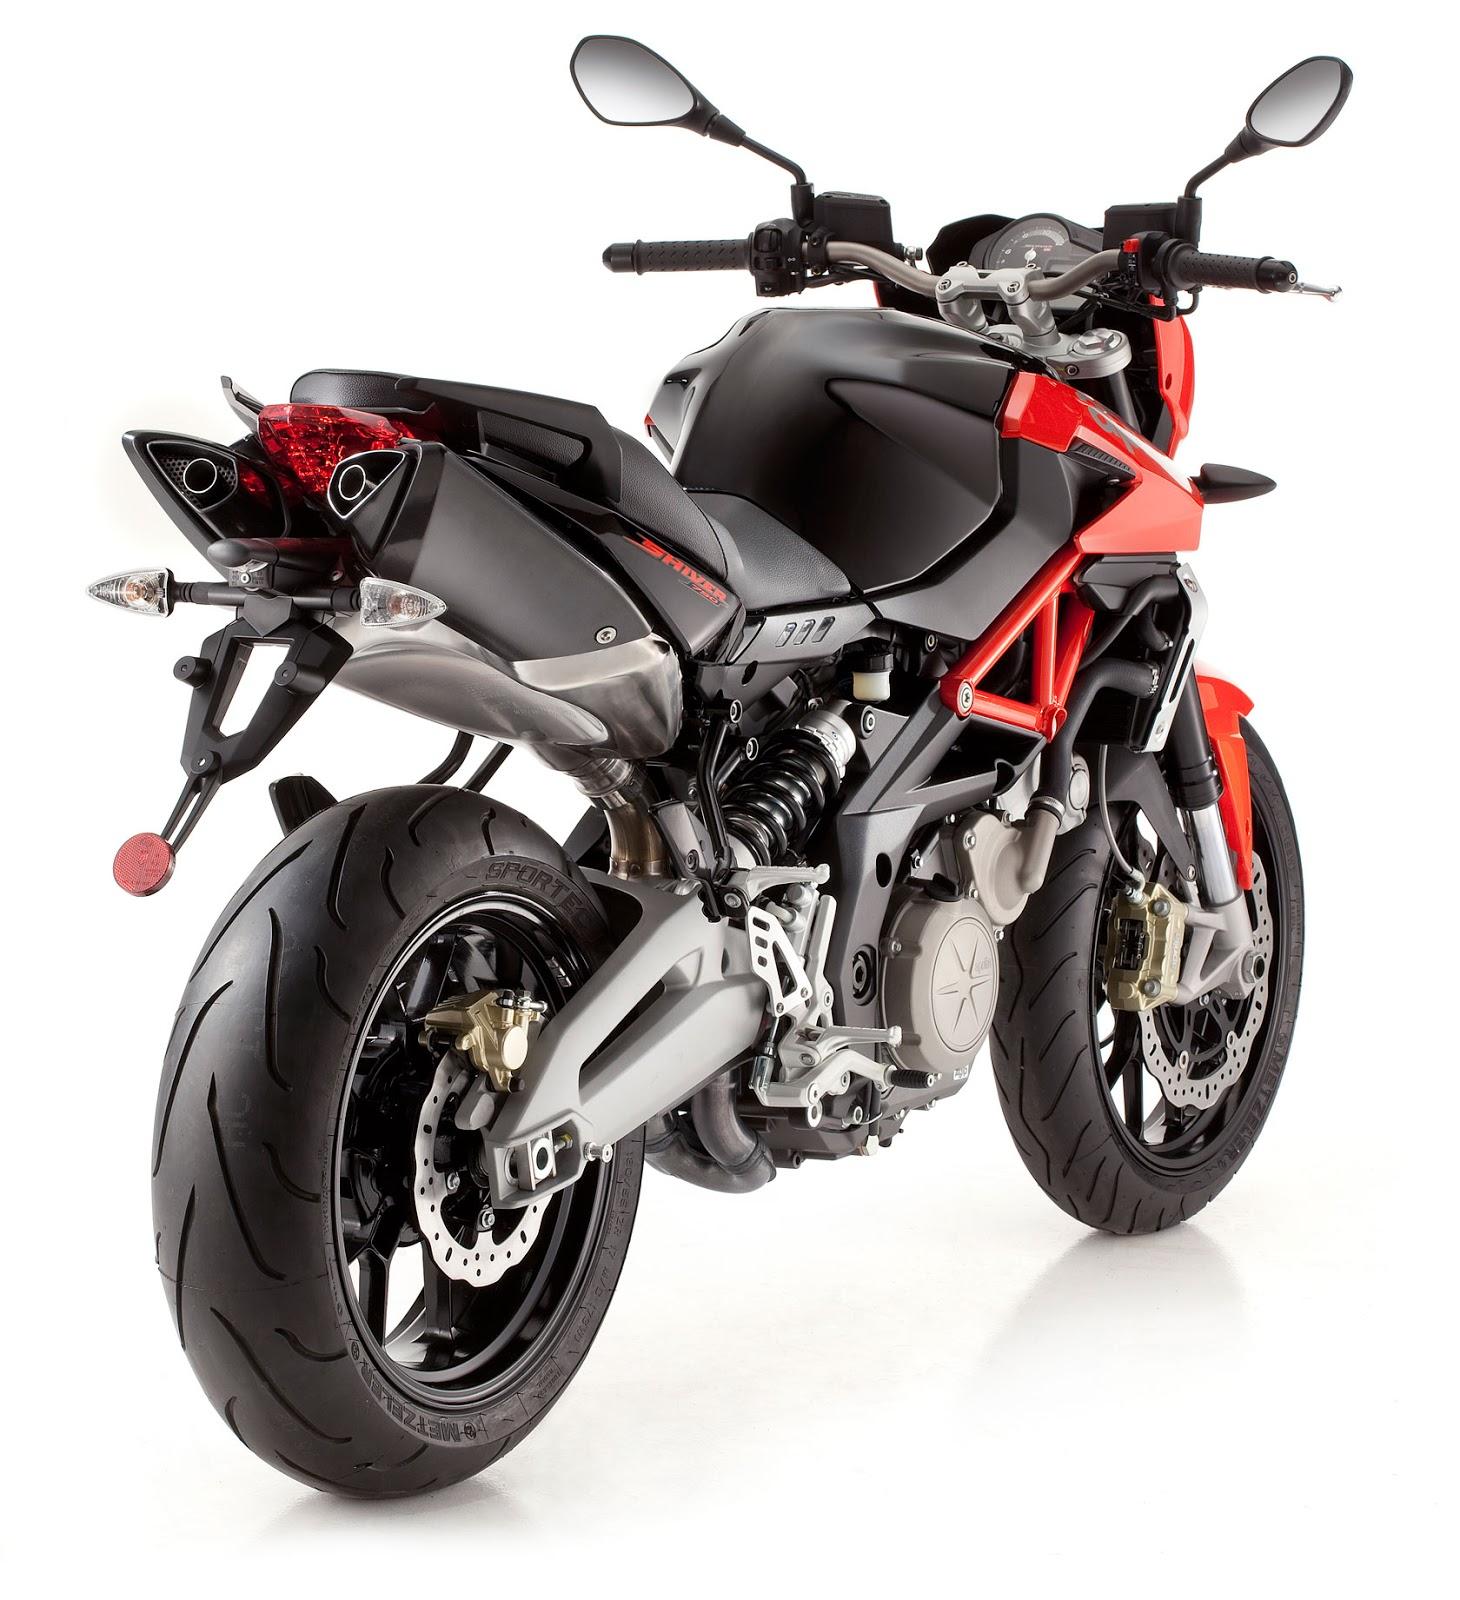 2013 aprilia shiver 750 latest motorcycle models. Black Bedroom Furniture Sets. Home Design Ideas